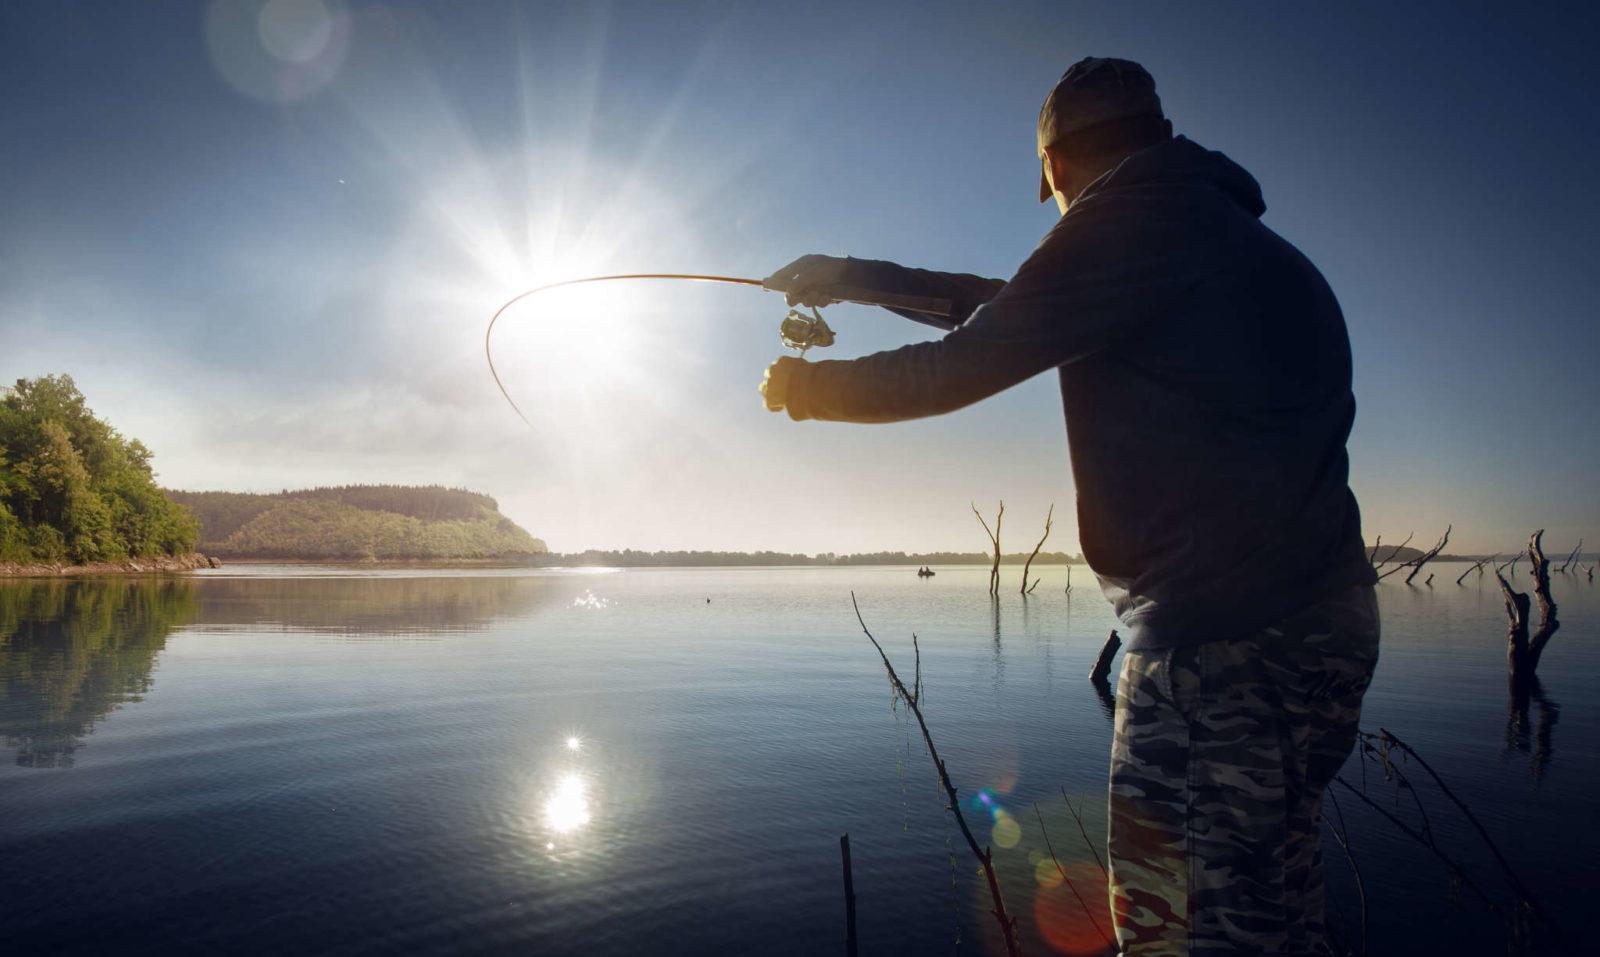 японский картинка мужчина на рыбалке переключения